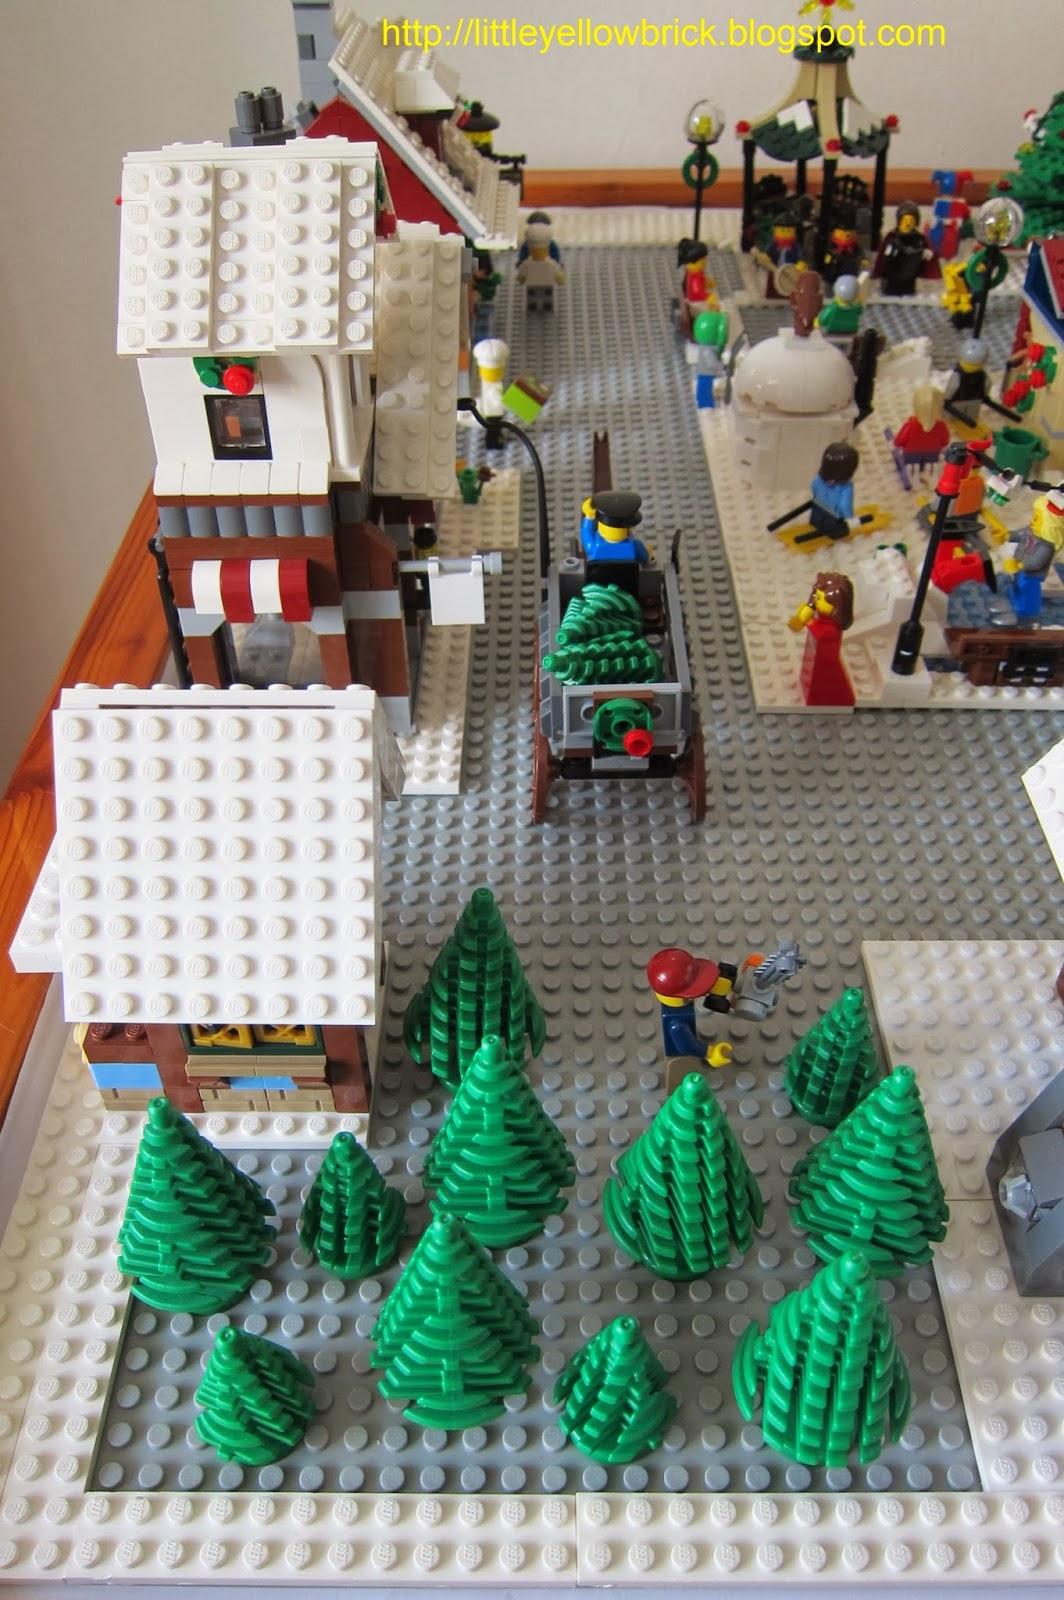 little yellow brick a lego blog our lego winter village LEGO Creator Winter Cottage 10229 Adriana Ave Cupertino CA